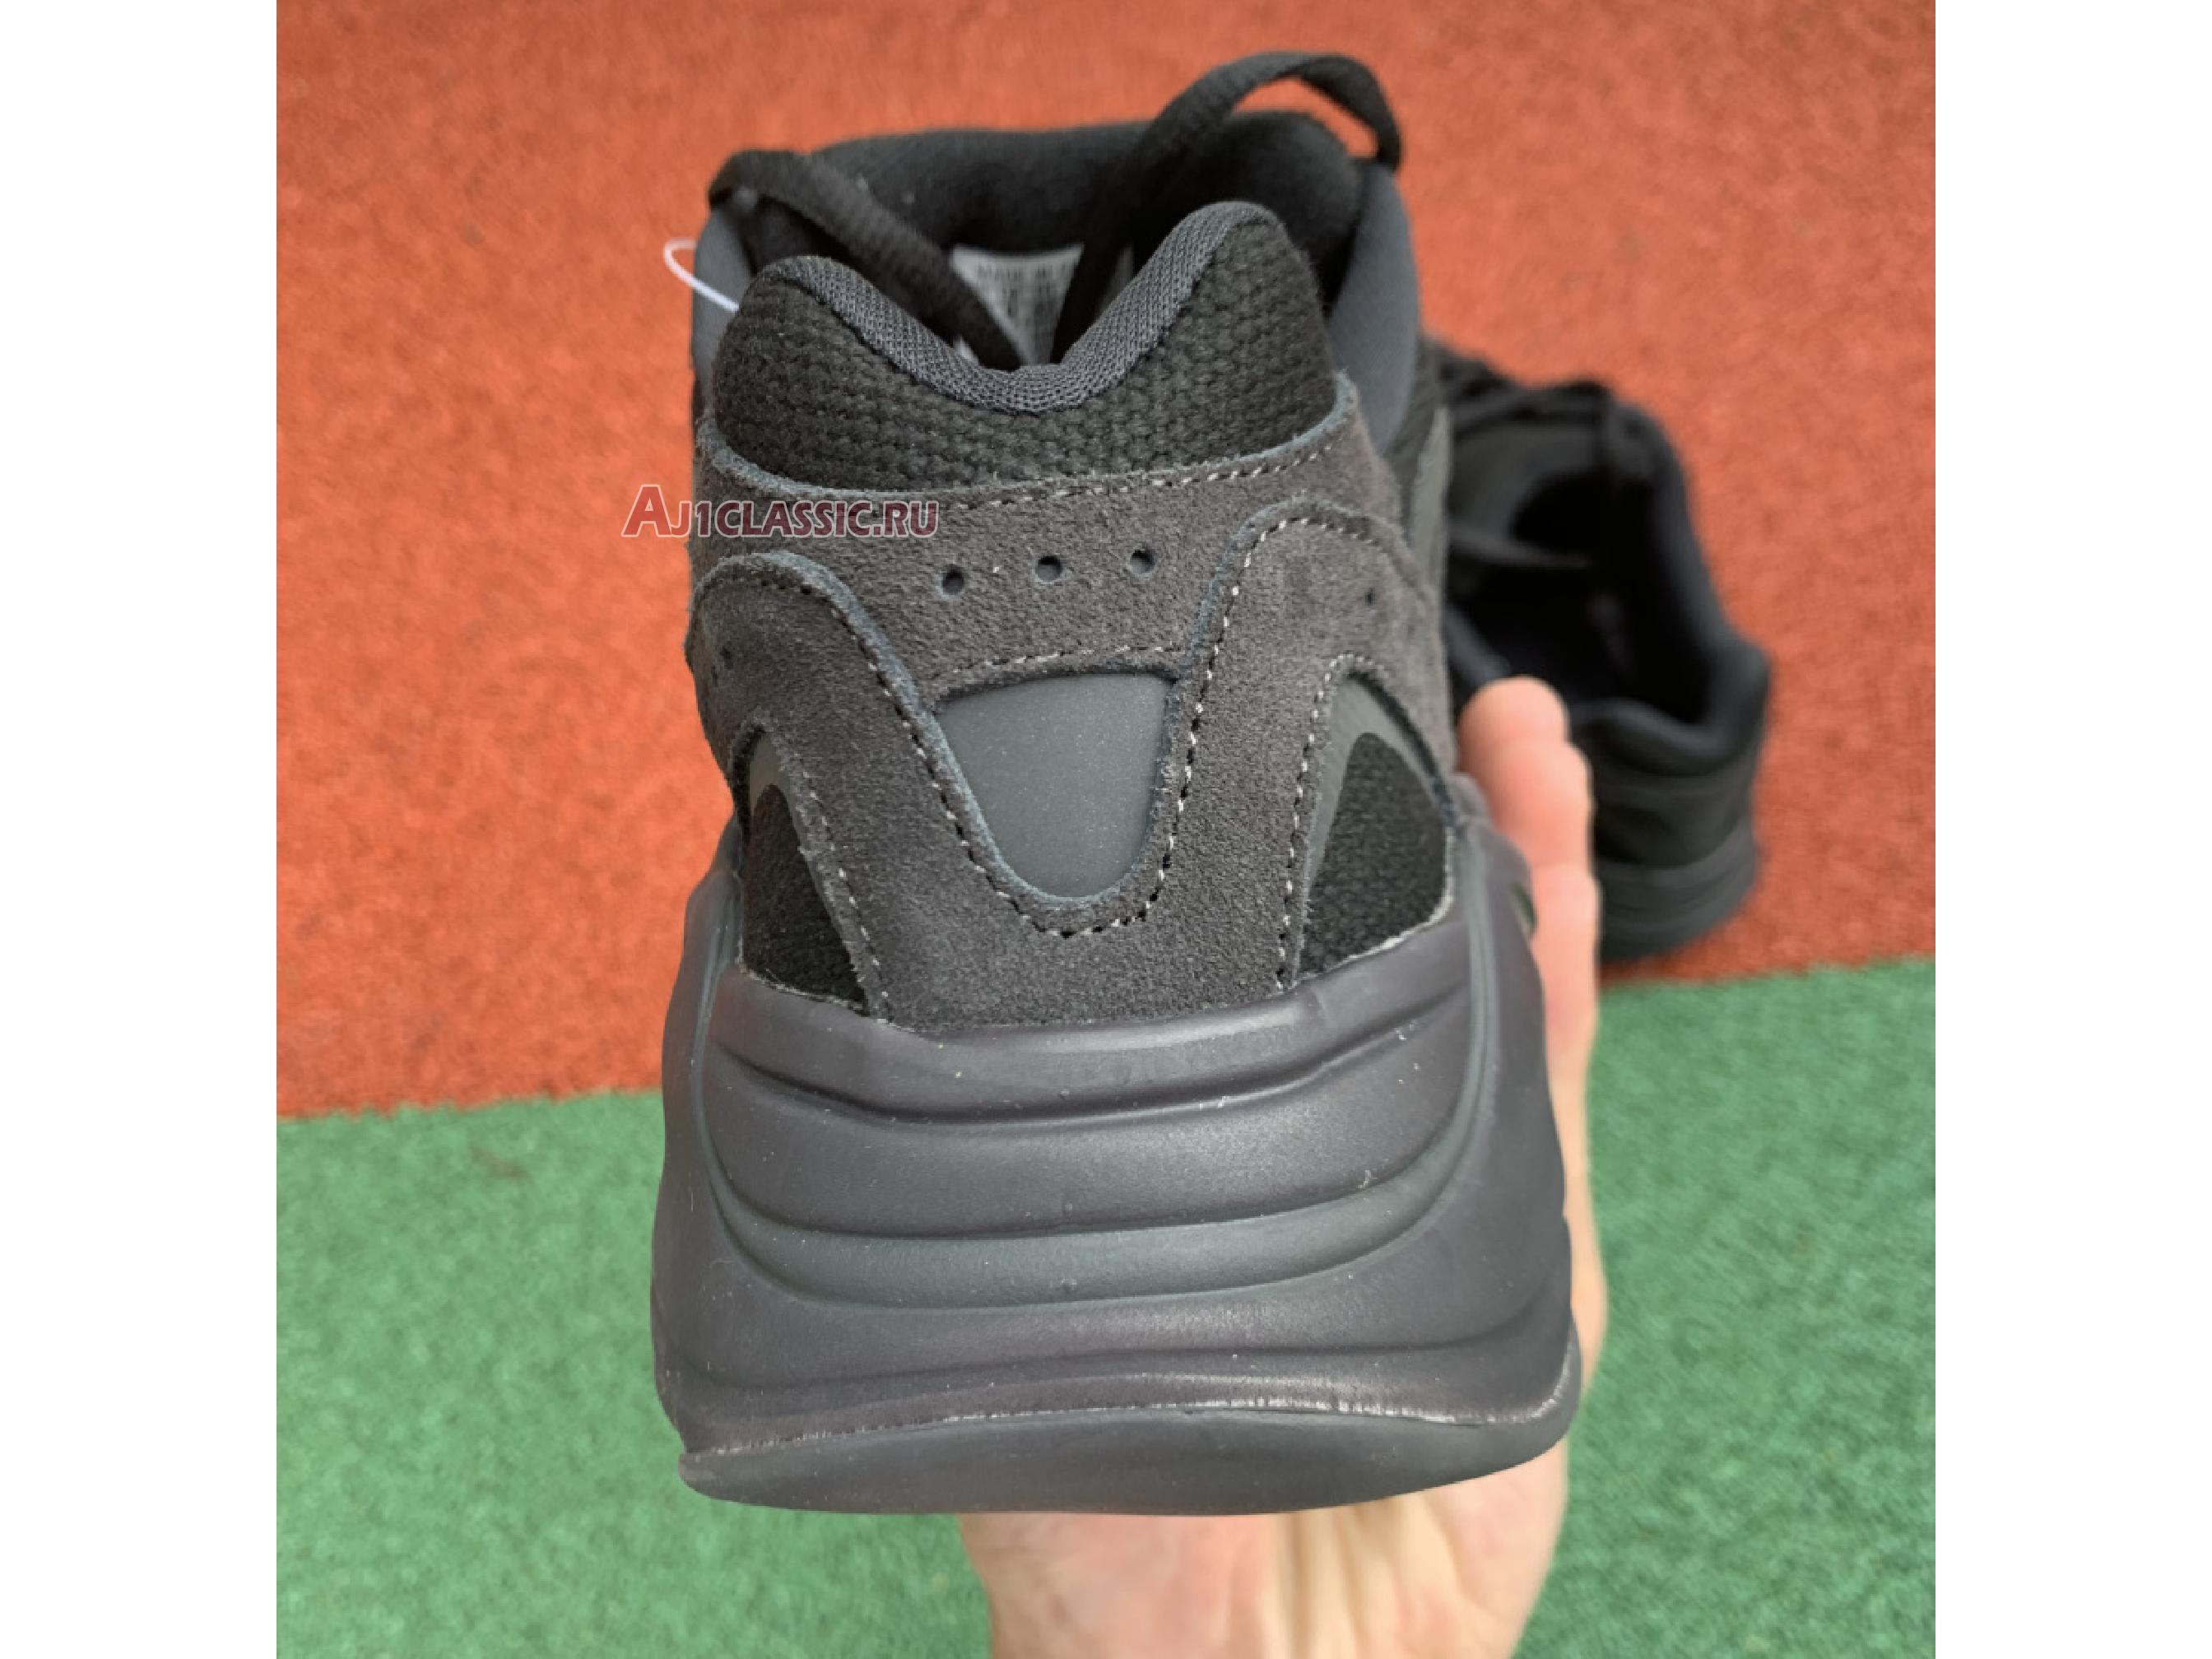 "Adidas Yeezy Boost 700 V2 ""Vanta"" FU6684"